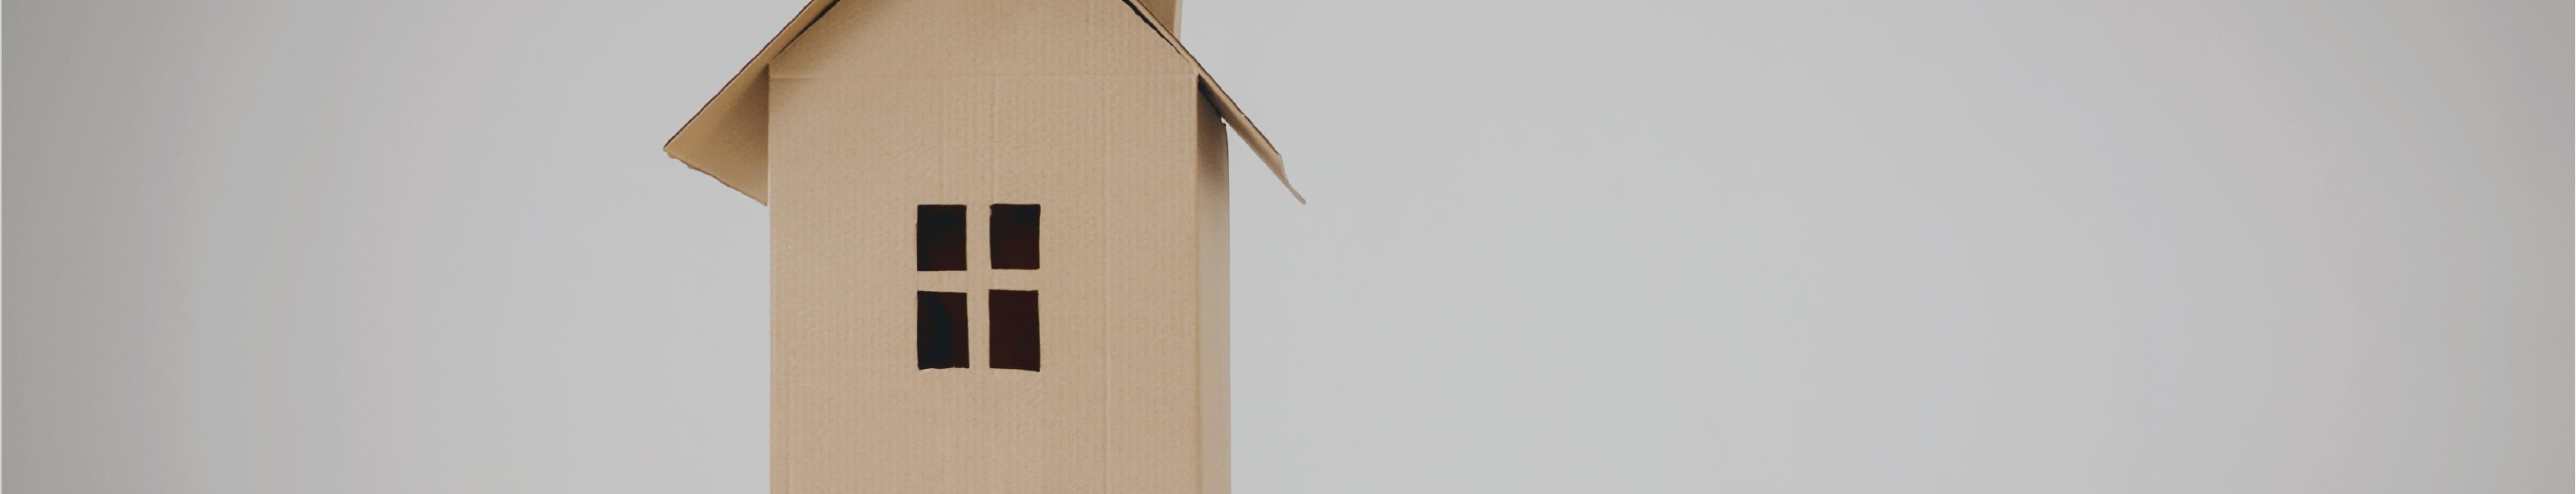 offre d 39 achat immobili re quels engagements. Black Bedroom Furniture Sets. Home Design Ideas